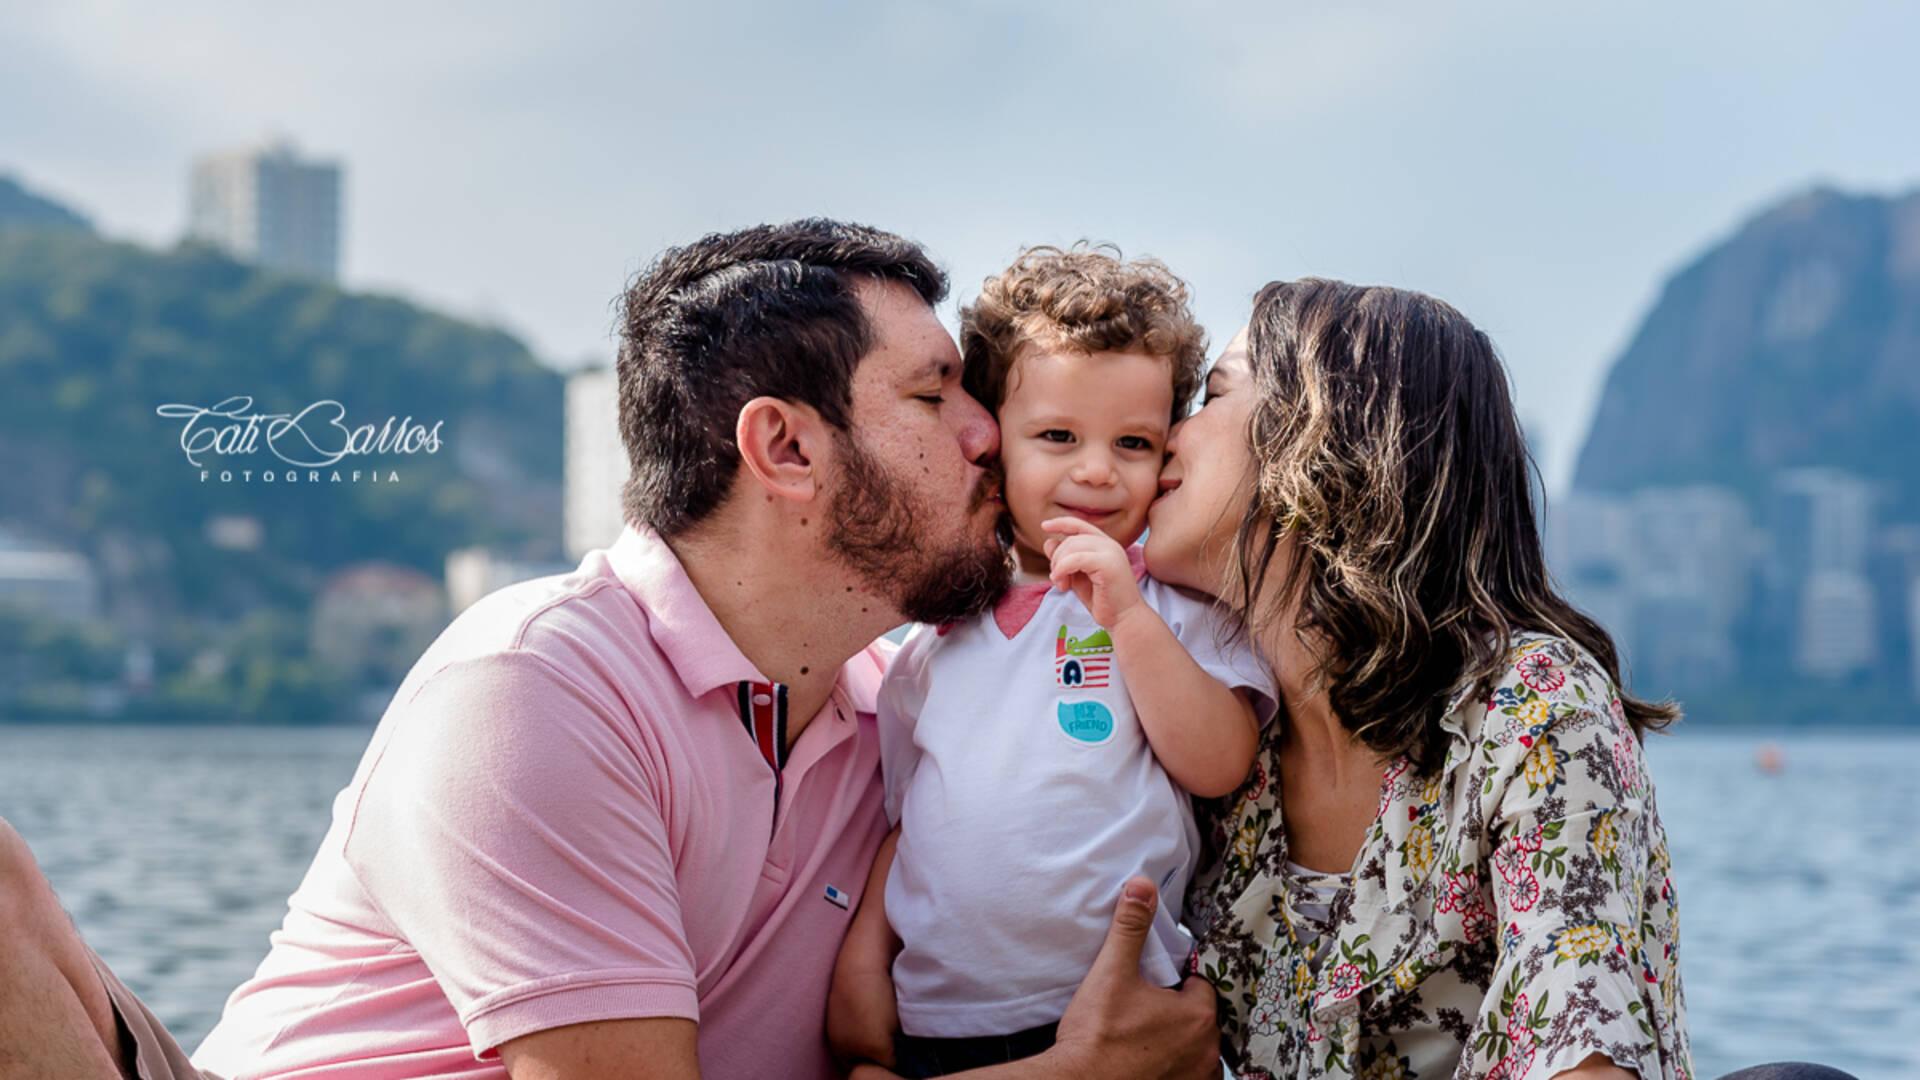 Família de Ensaio Família